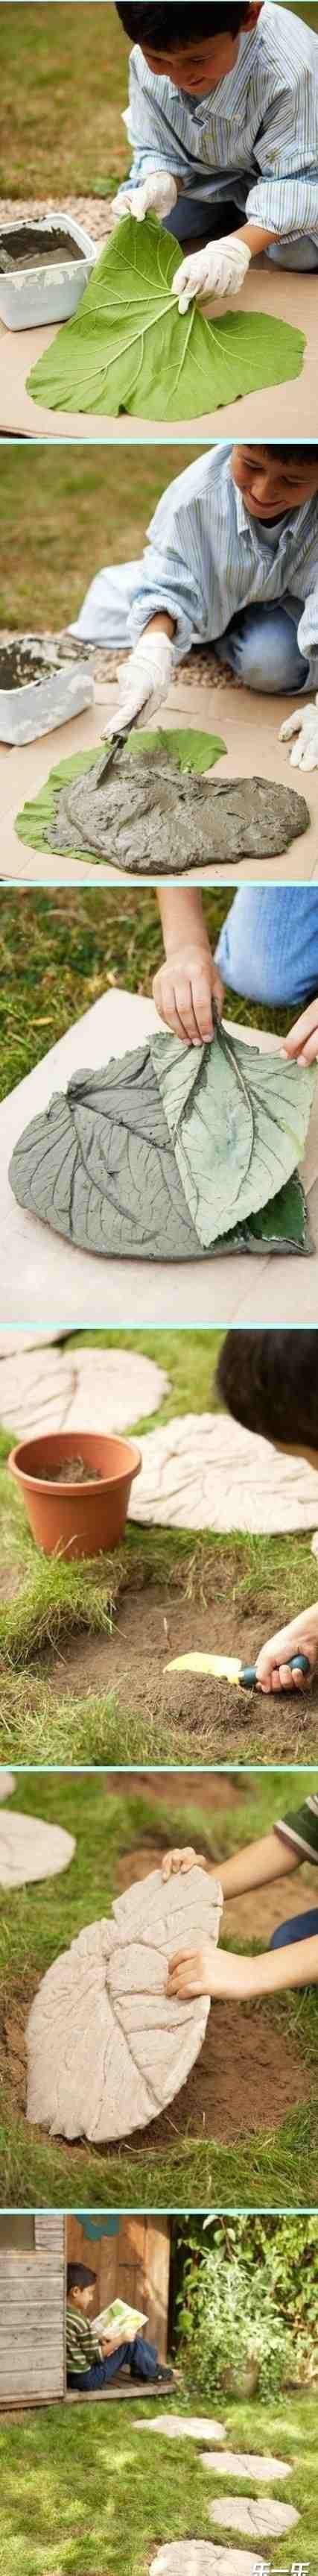 Gartendeko selbermachen ideen beton rhabarber funkien for Gartendeko zum selbermachen